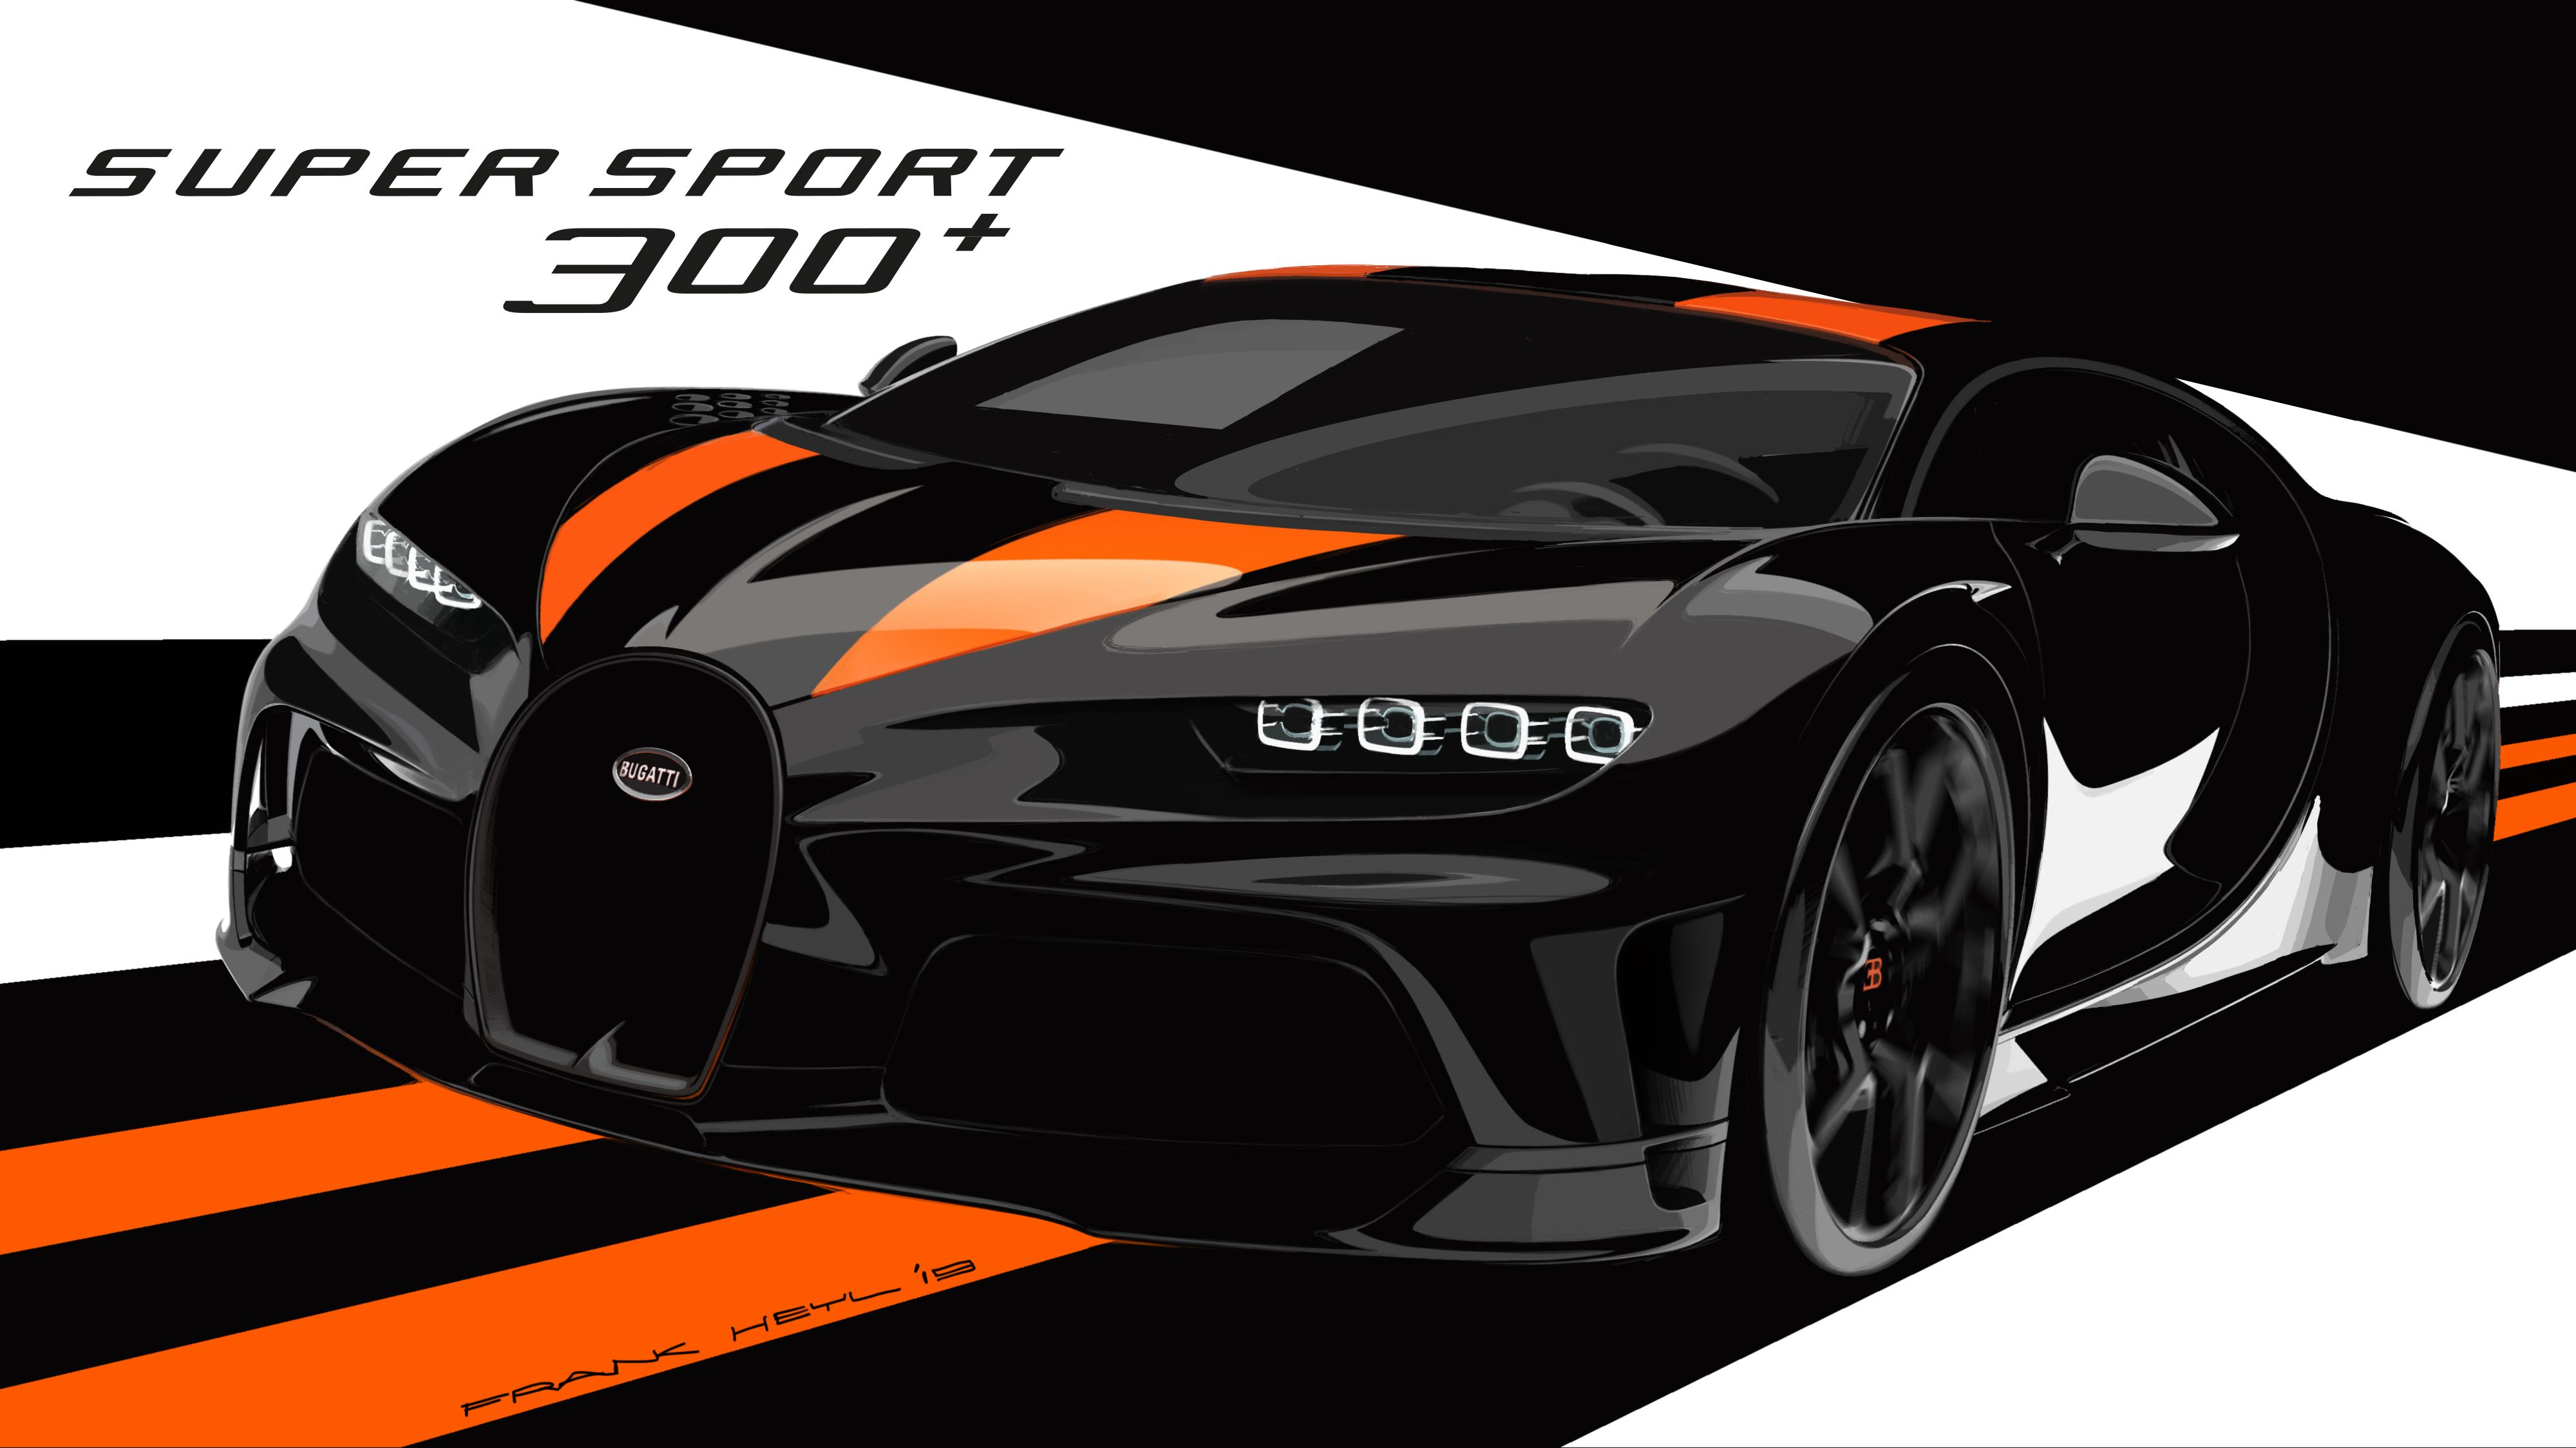 2020 Bugatti Chiron Super Sport 300 Top Speed Bugatti Chiron Sports Cars Bugatti Bugatti